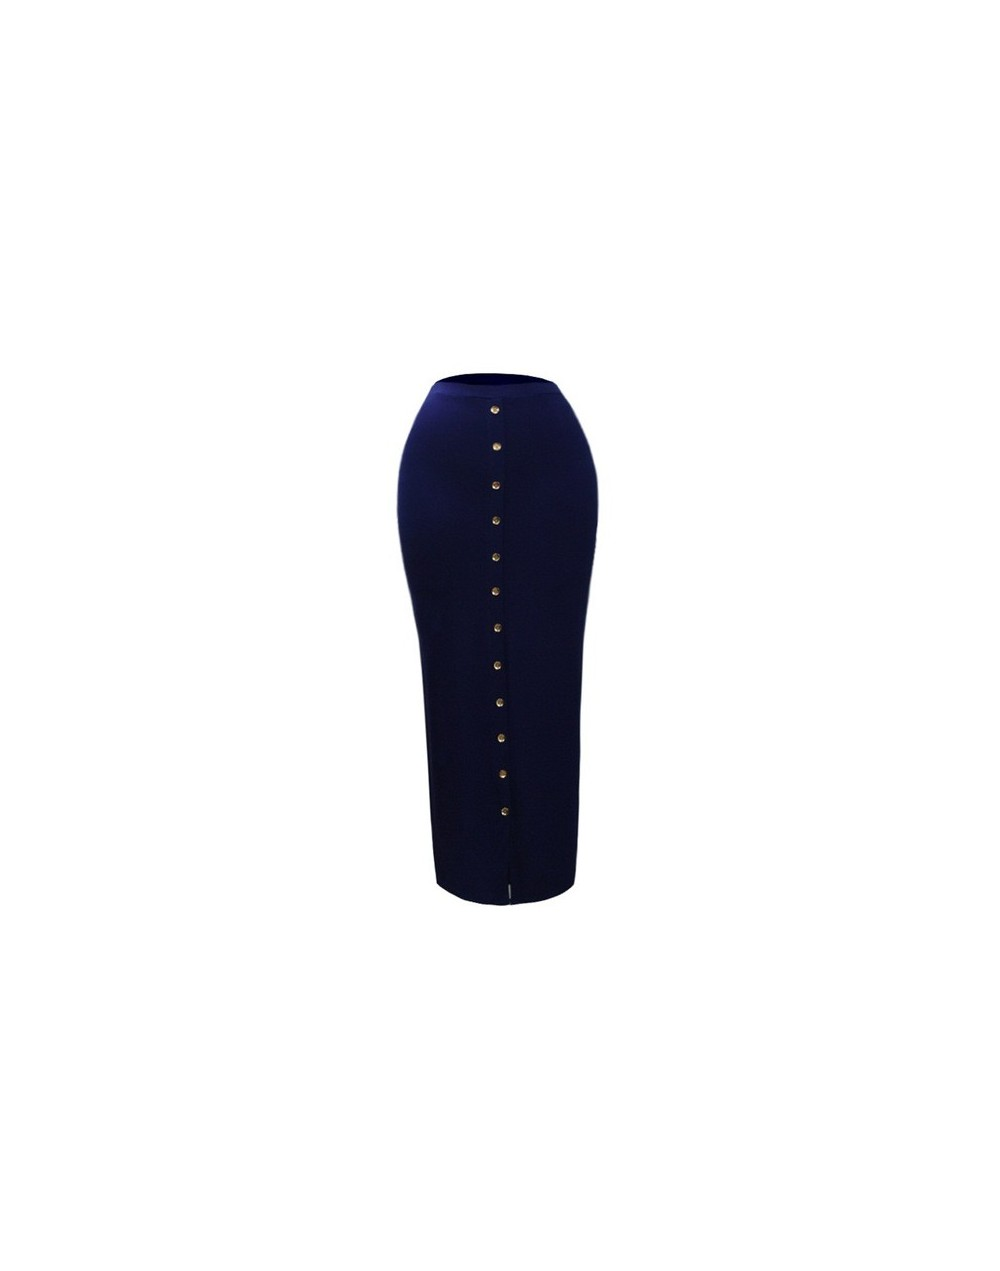 Plus Size 2019 Summer Abaya Muslim Women High Waist Button Bodycon Maxi Skirt Long Turkish Islamic Skirts Bandage Pencil Ski...